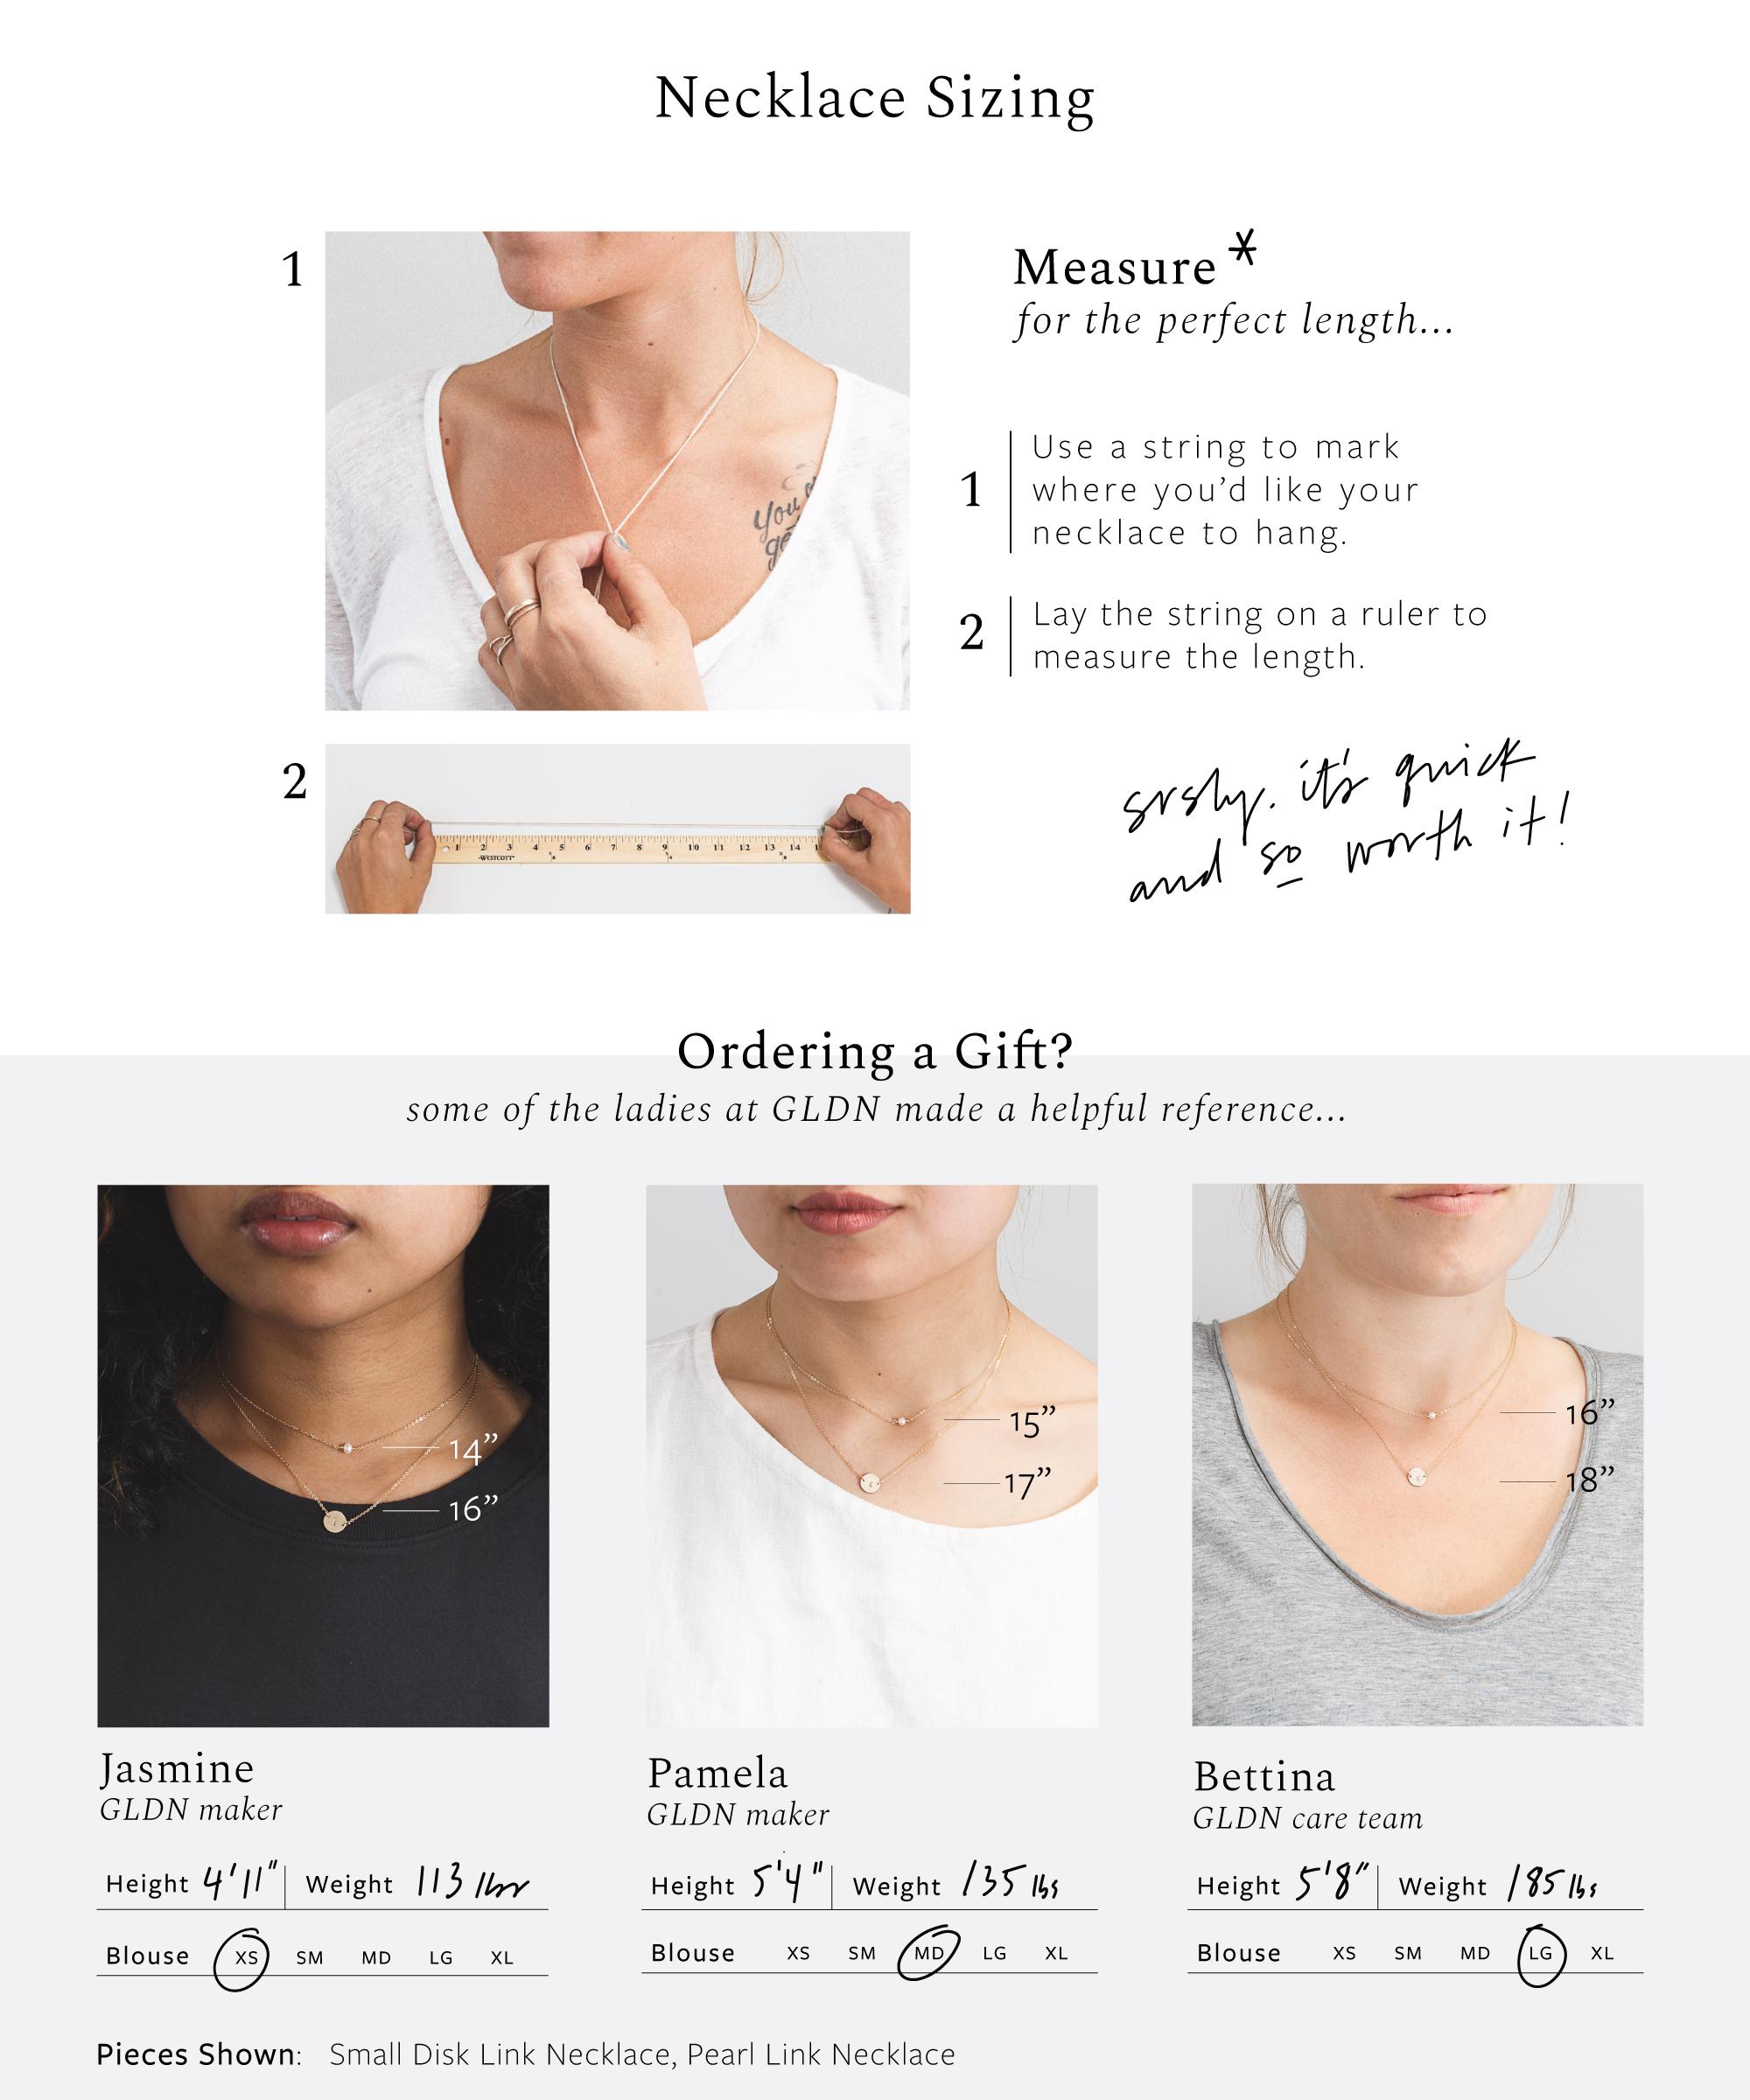 short_link_necklace_sizing.jpg